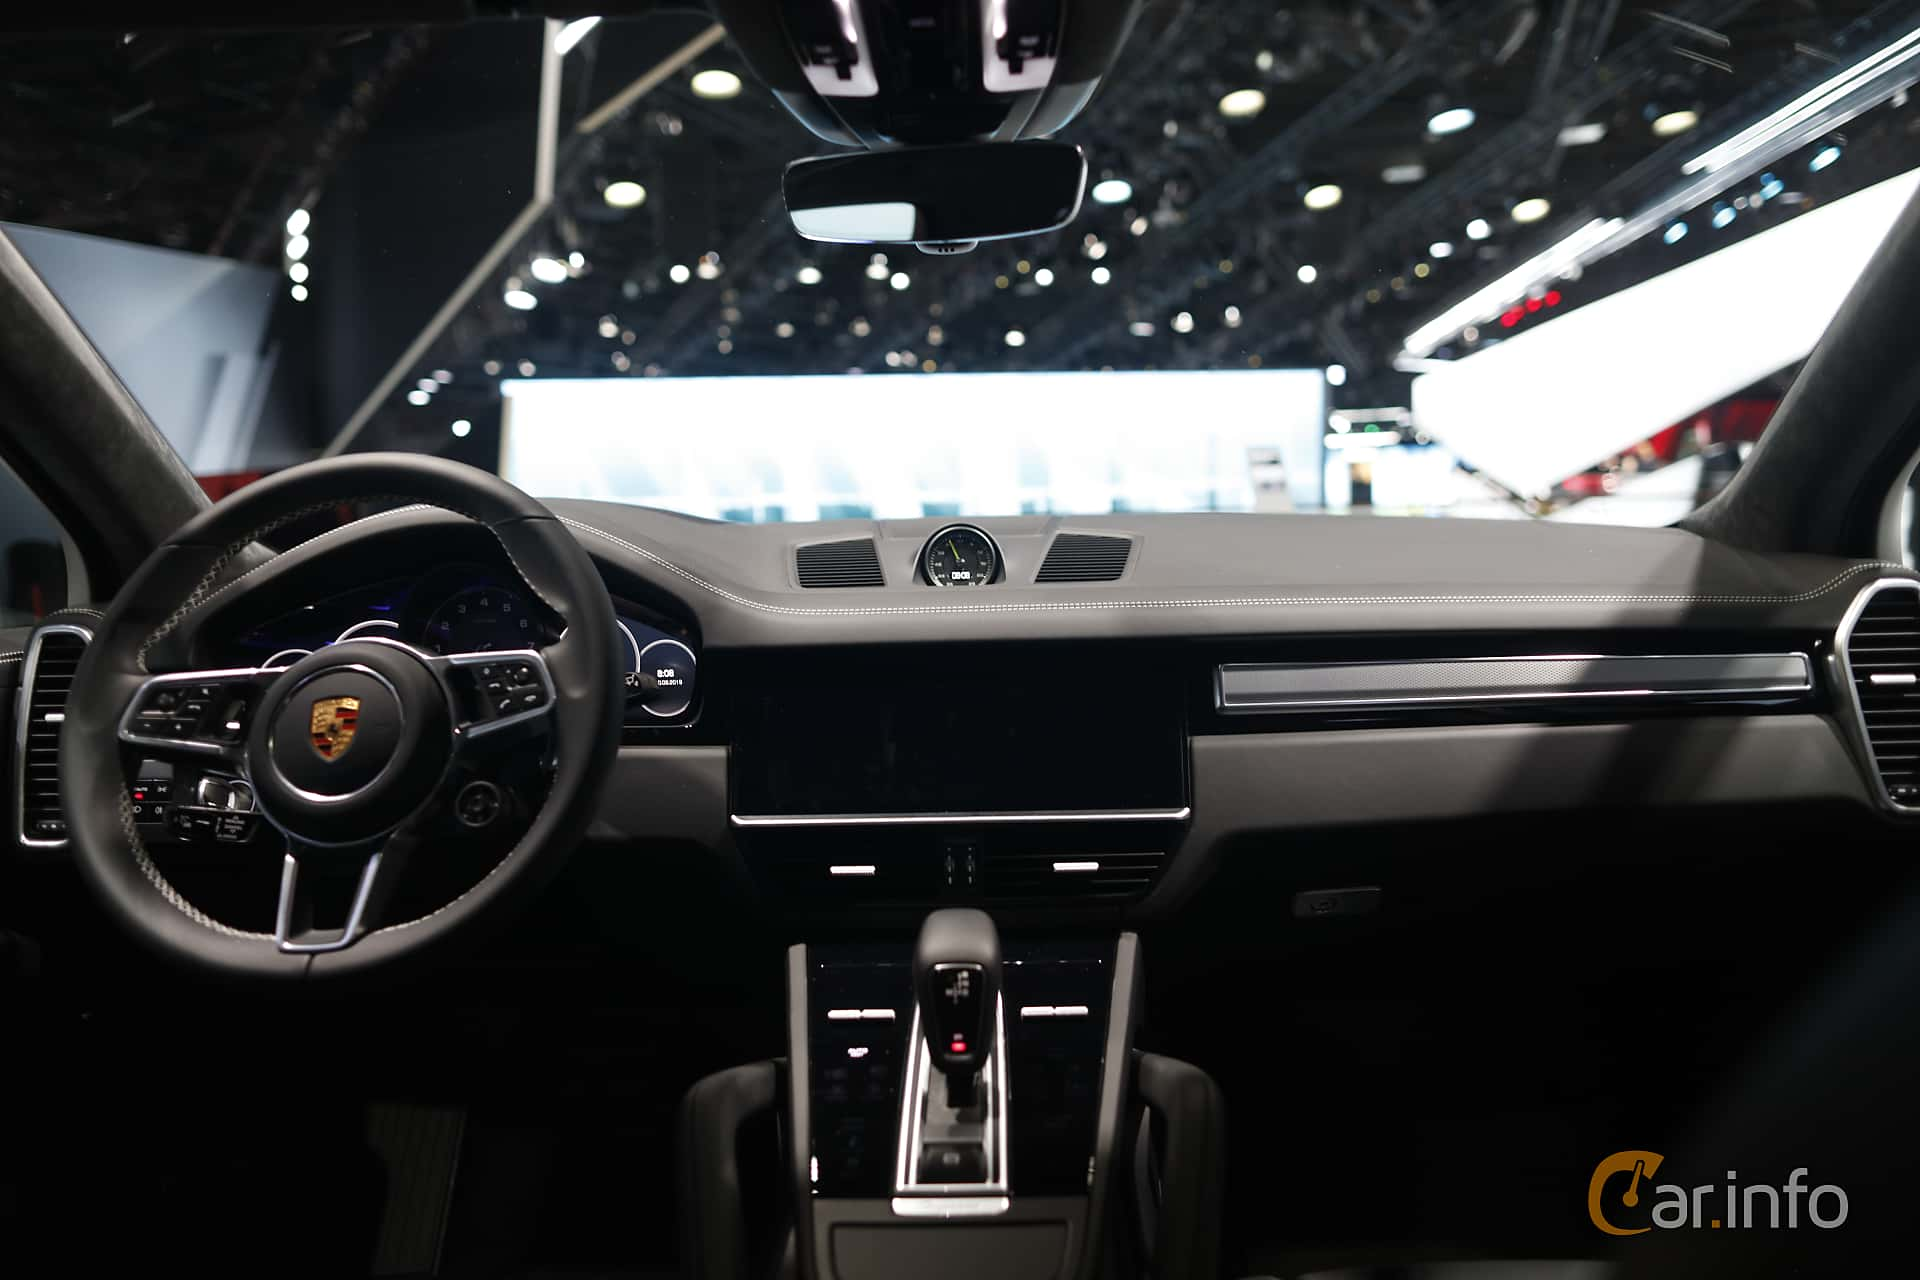 Porsche Cayenne E-Hybrid 3.0 V6 4 + 14.1 kWh TipTronic S, 462hp, 2020 at IAA 2019